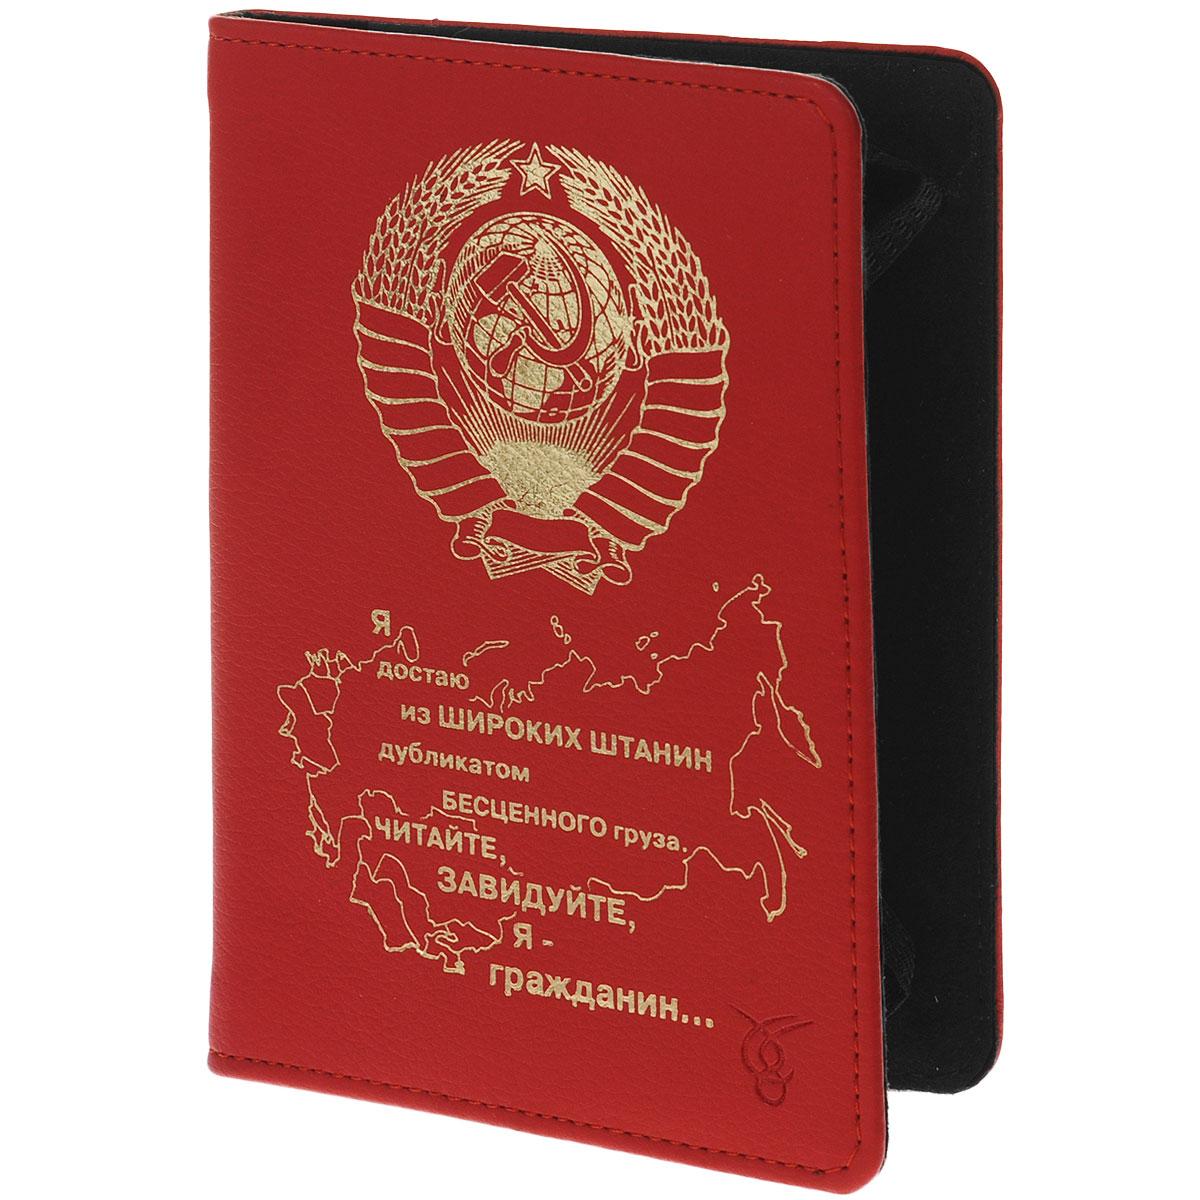 "Vivacase Soviet чехол для планшетов 7""+, Red (VUC-CSV07P-r)"